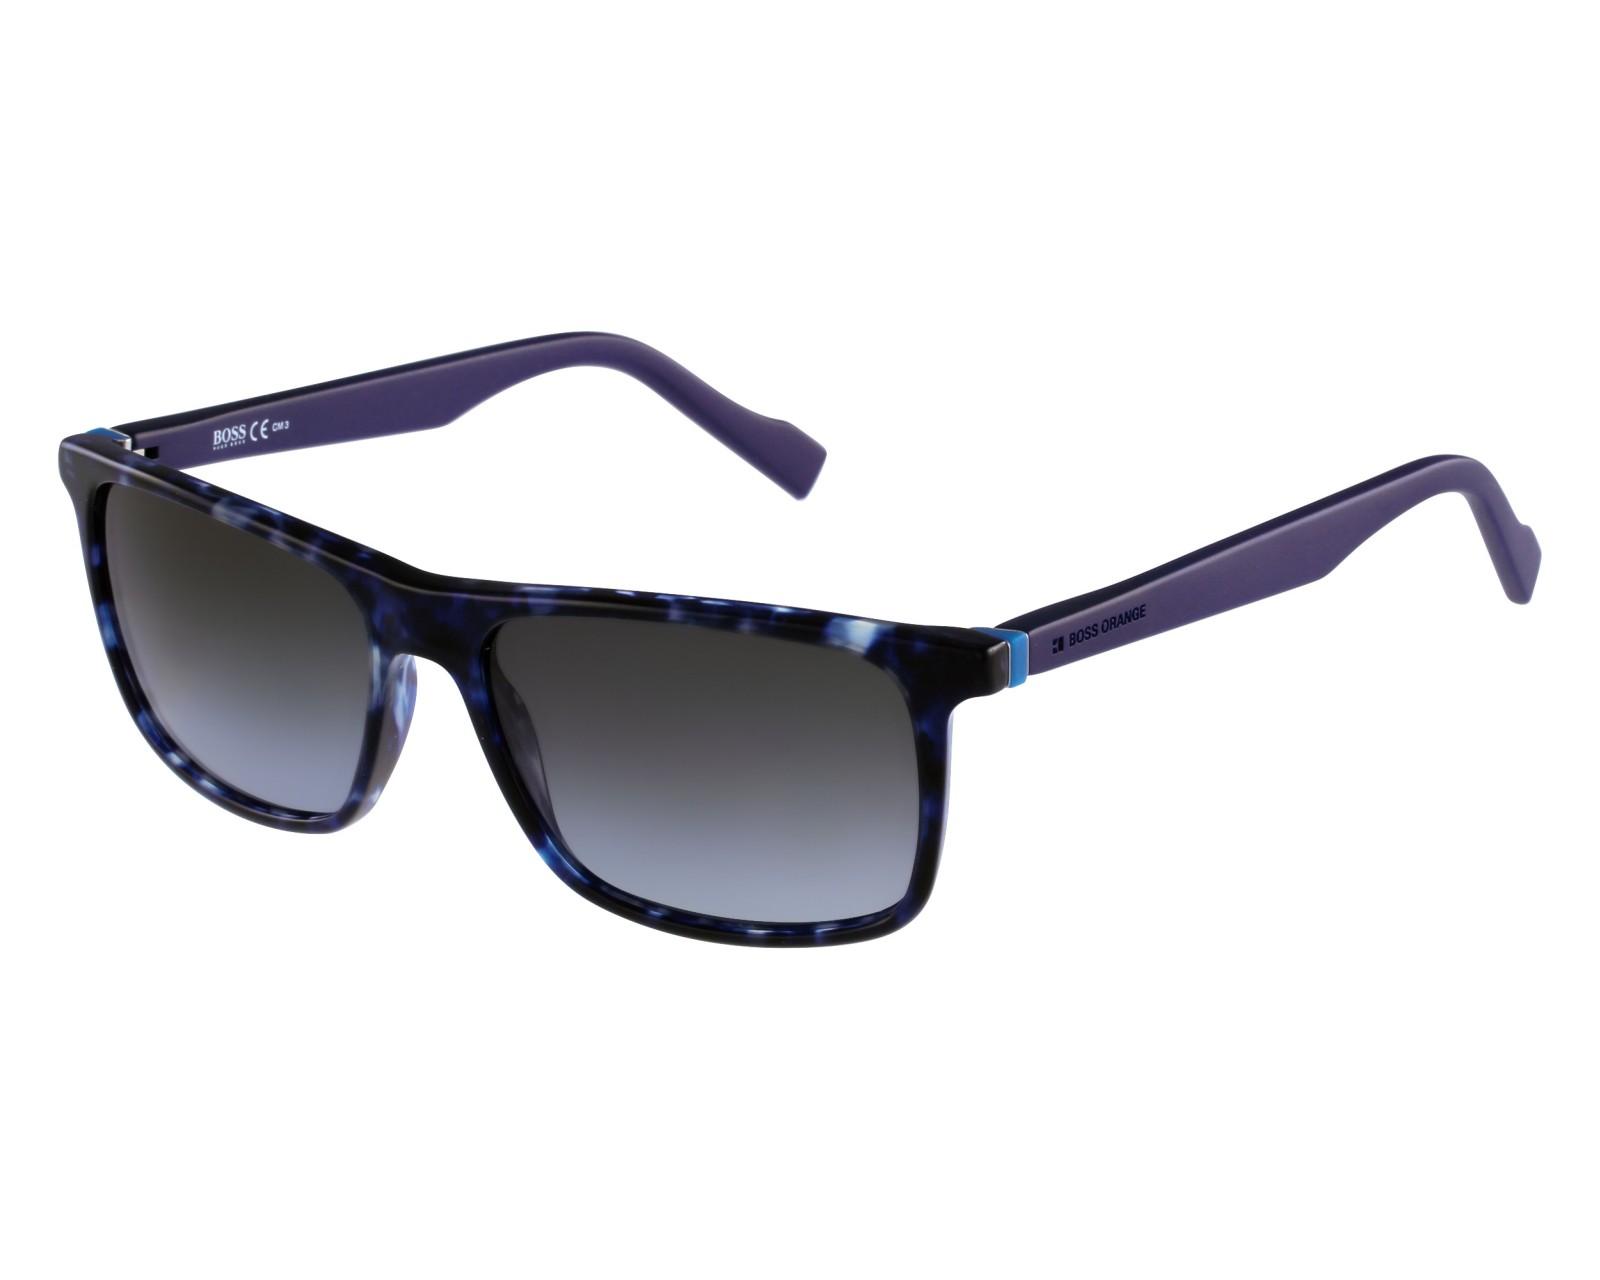 750a8a6061 Sunglasses Boss Orange BO-0174-S JIY PT 55-16 Blue front